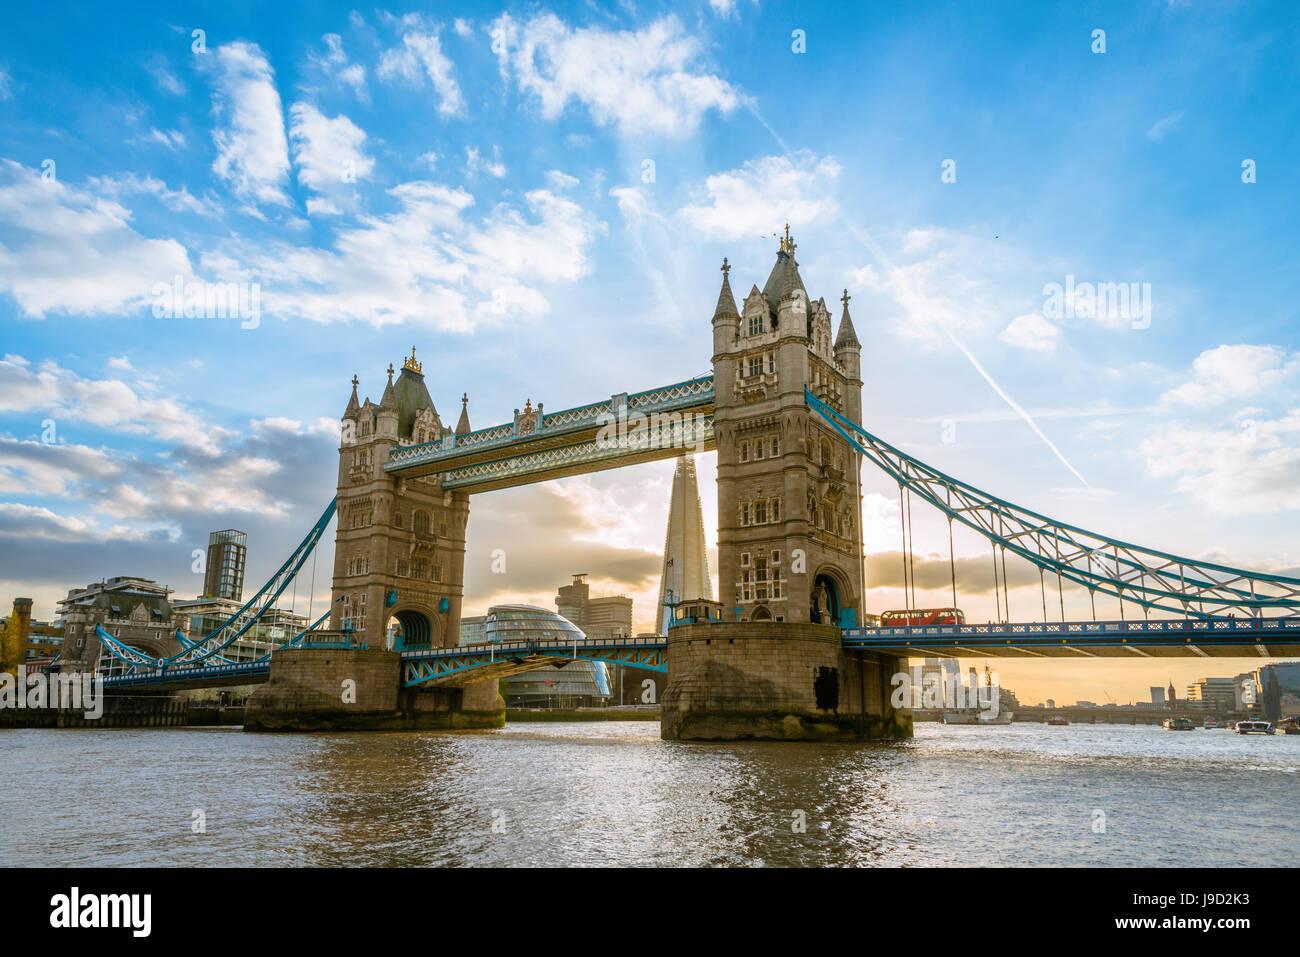 Tower Bridge sur la Tamise, Londres, Angleterre, Royaume-Uni Photo Stock